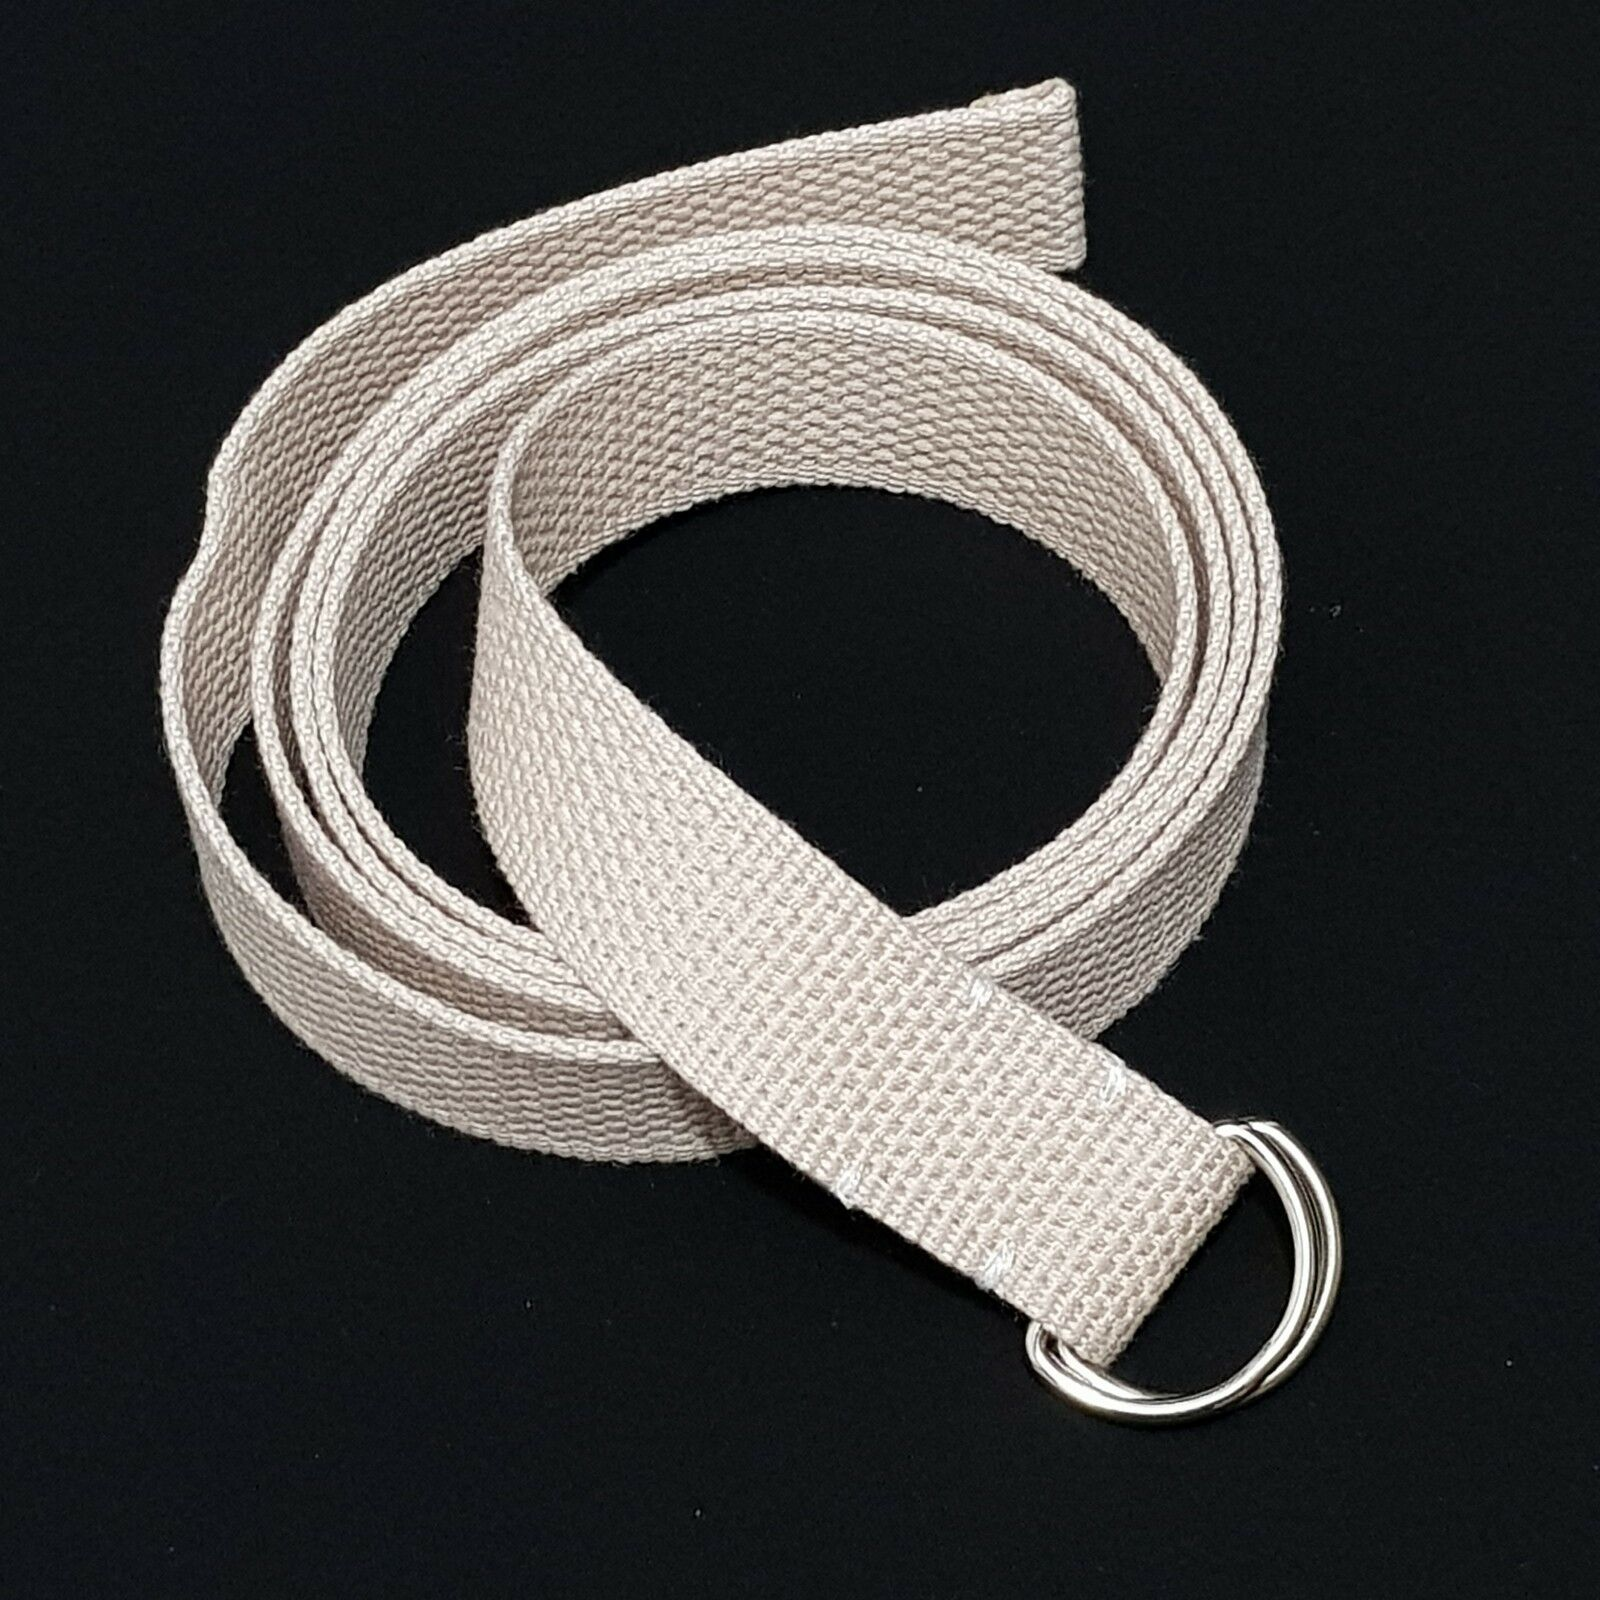 5XL / W50 D schnelle Gürtel Jeansgurtel hosengürtel Hüftgürtel stoffgürtel Gurt